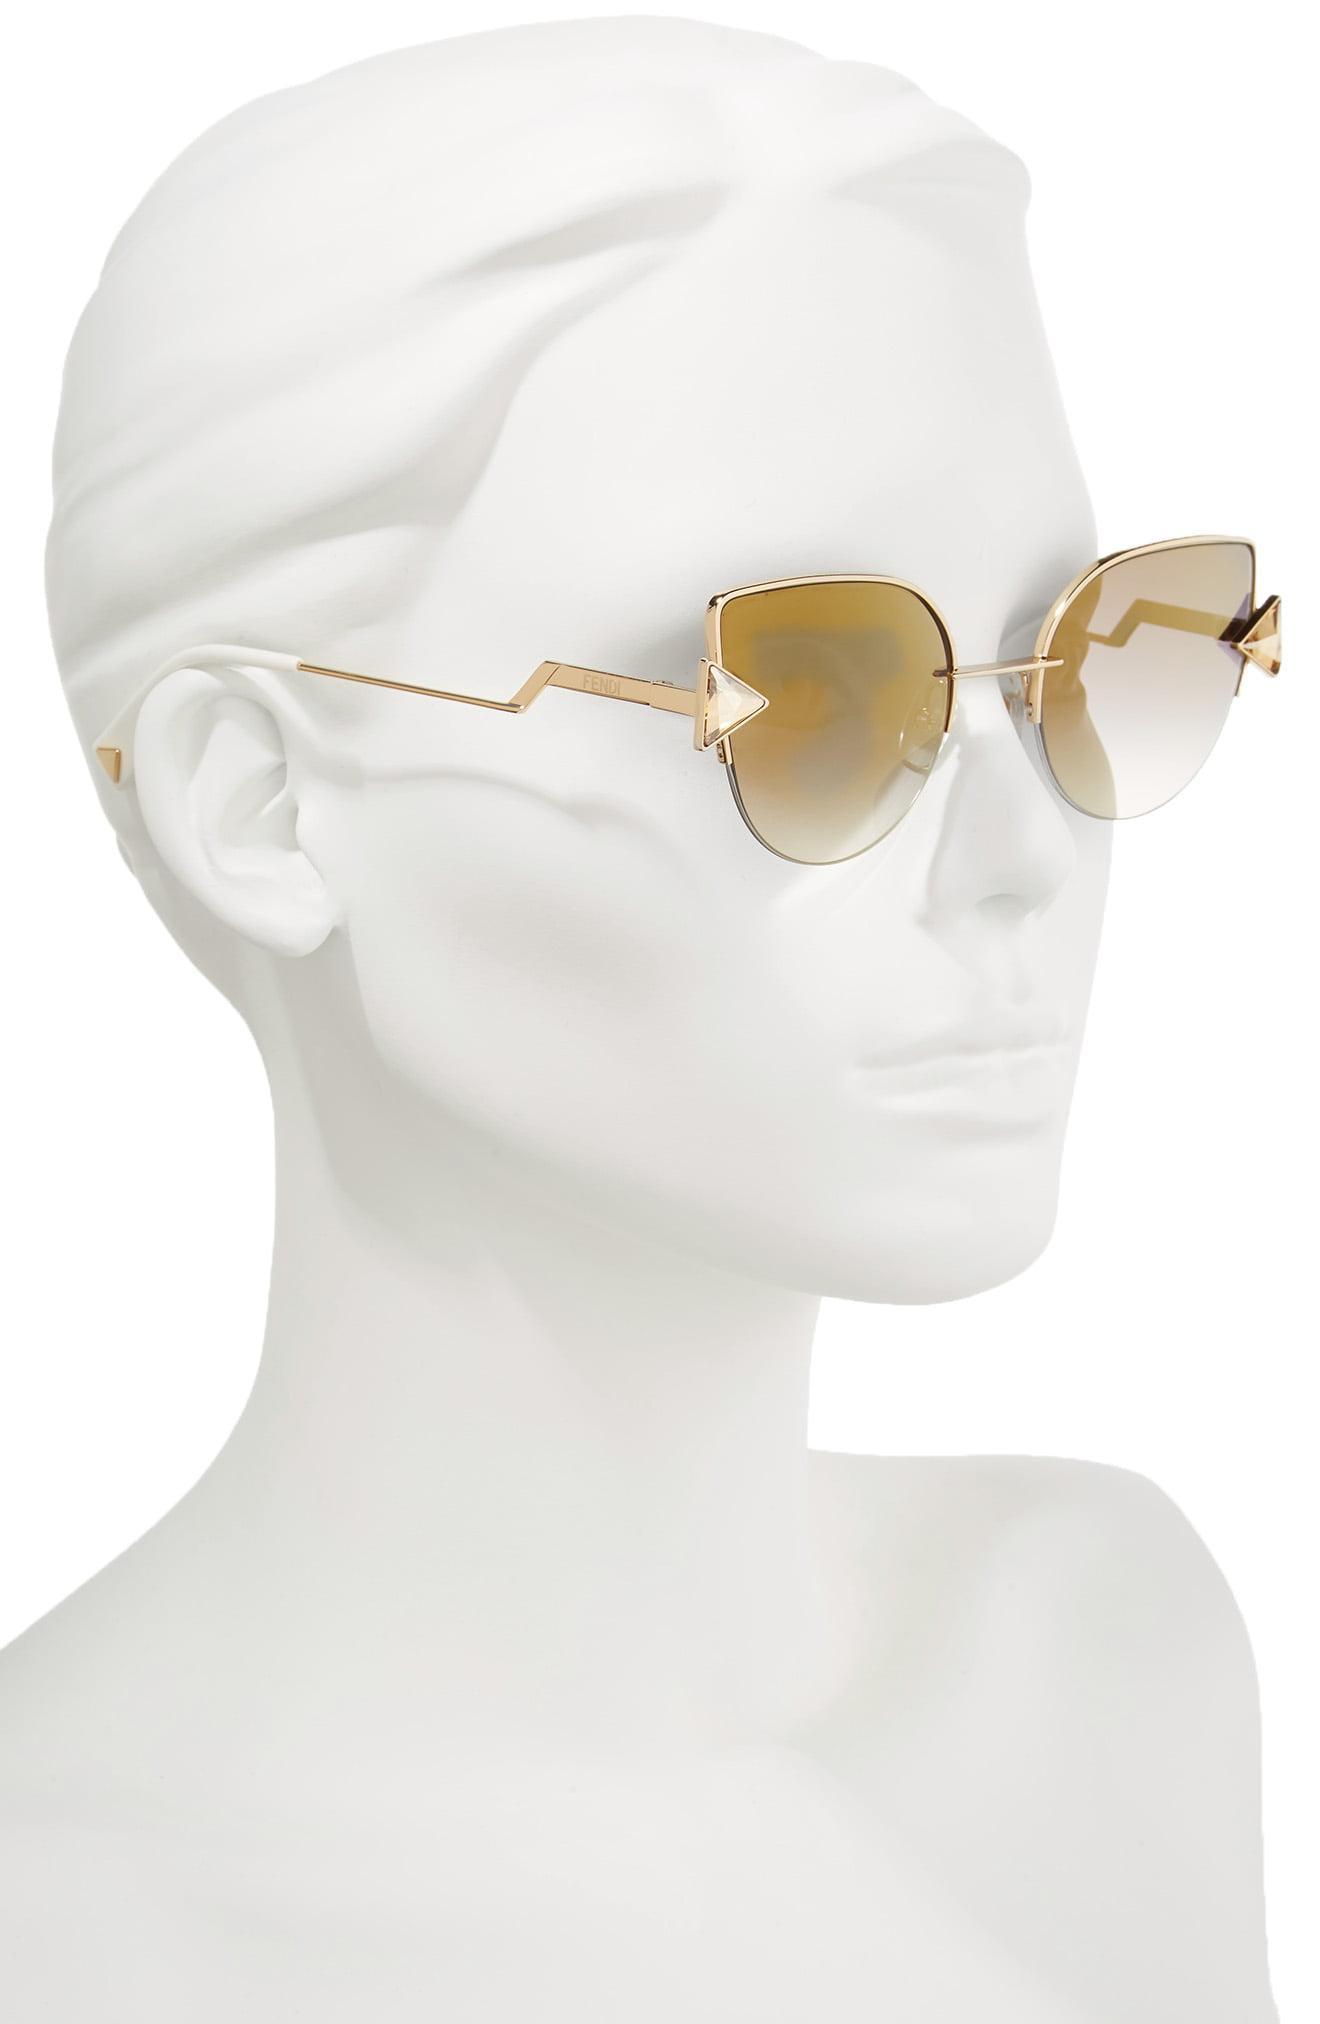 4212e1691c67 Fendi - Metallic Rainbow 52mm Semi-rimless Sunglasses - Lyst. View  fullscreen